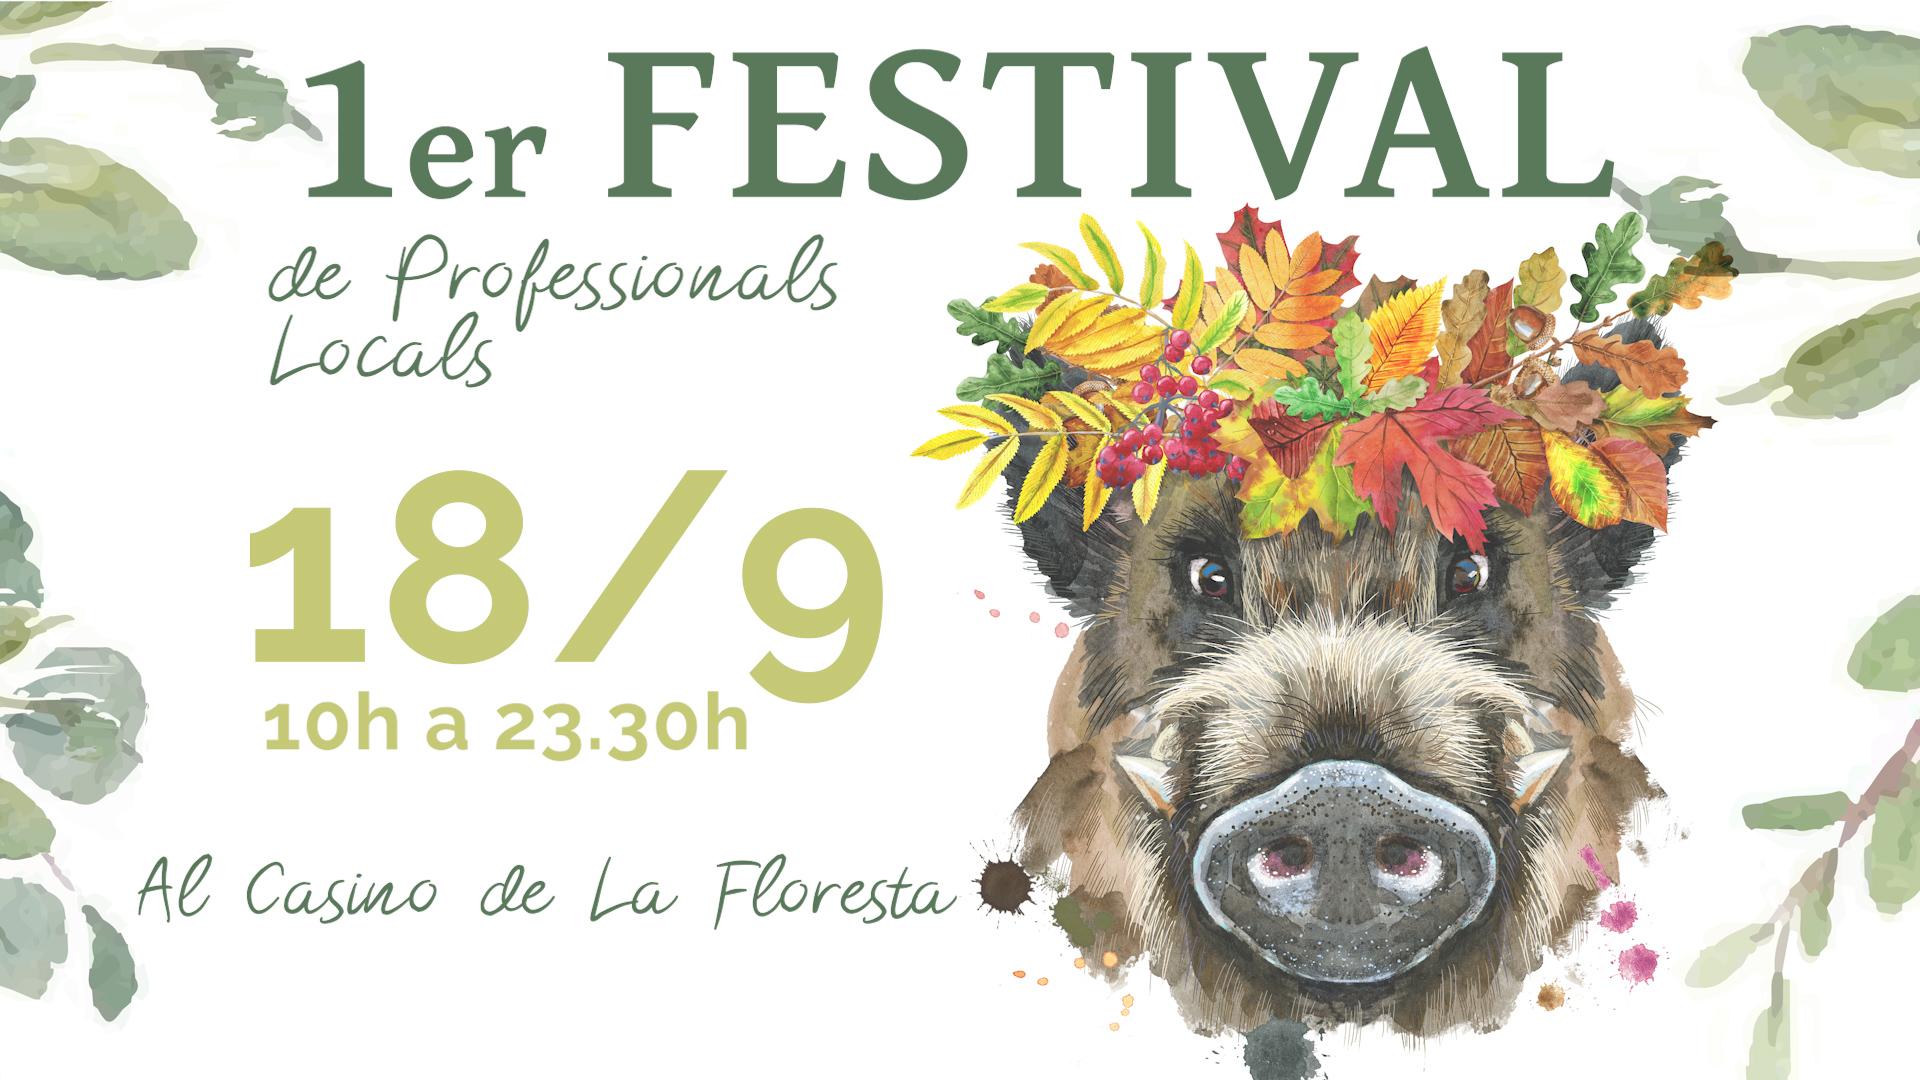 SPOT 1er Festival de Profesionales Locales